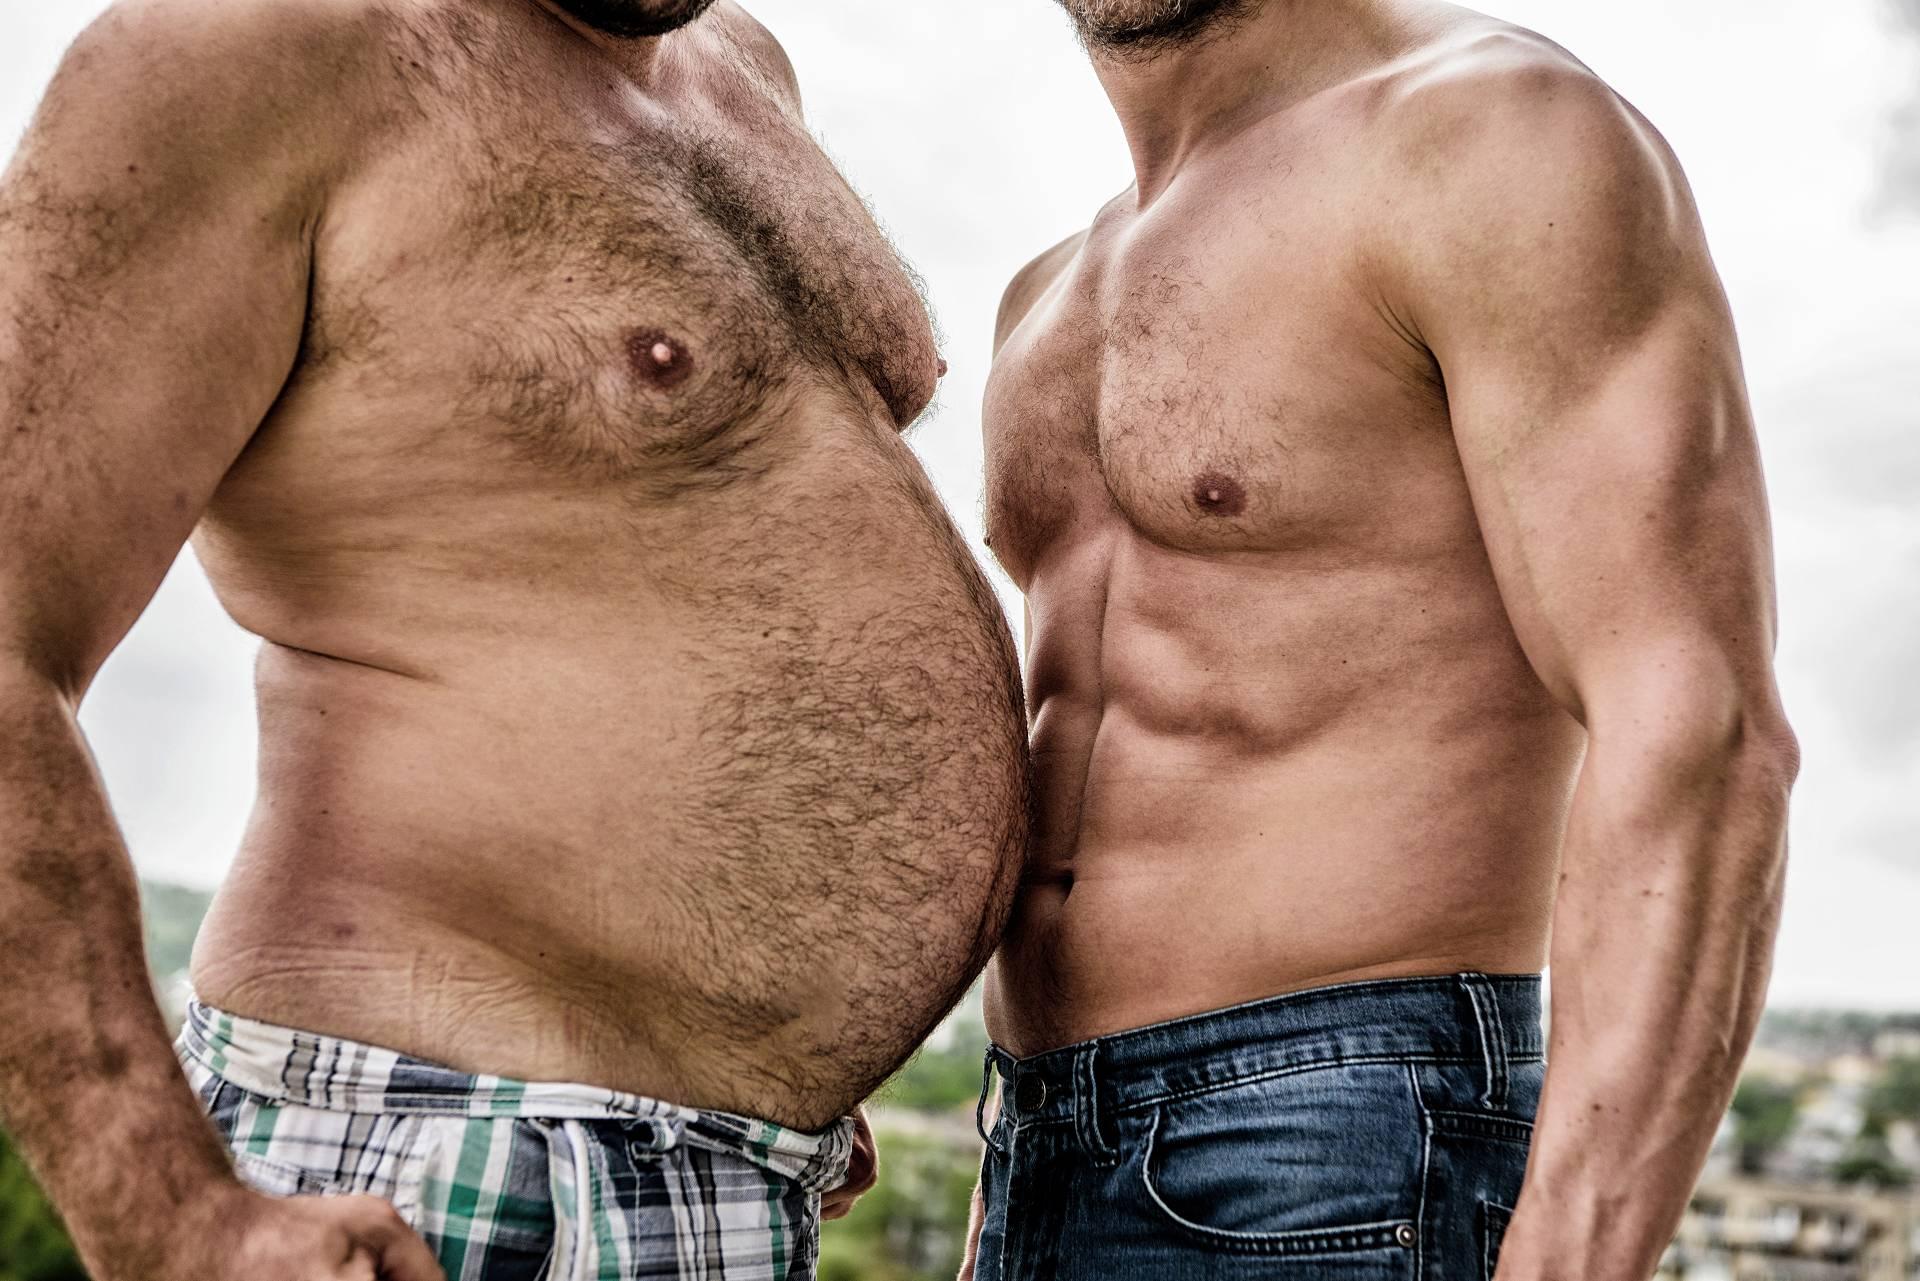 Bauchfett adé: Ausdauertraining, Krafttraining – oder eine Kombination aus beidem?